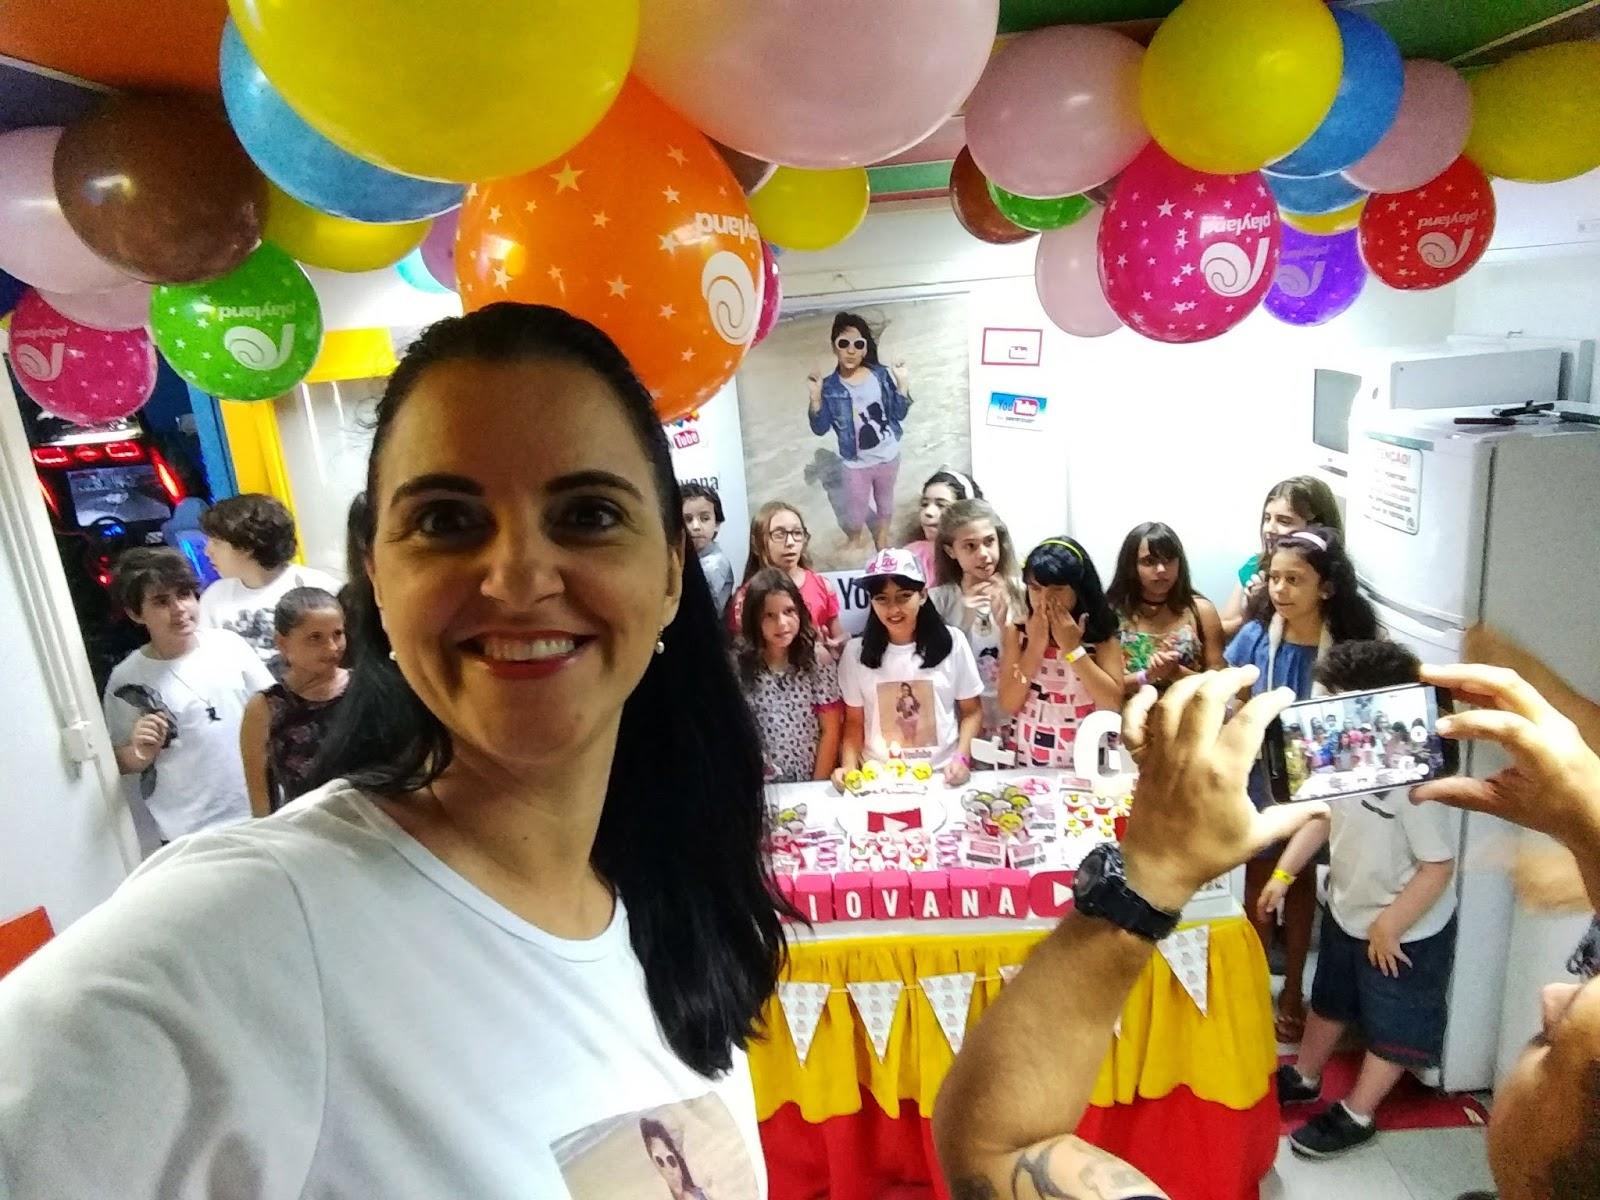 Festa De 10 Anos Da Gi Tema Youtube Da Fertilidade à Maternidade